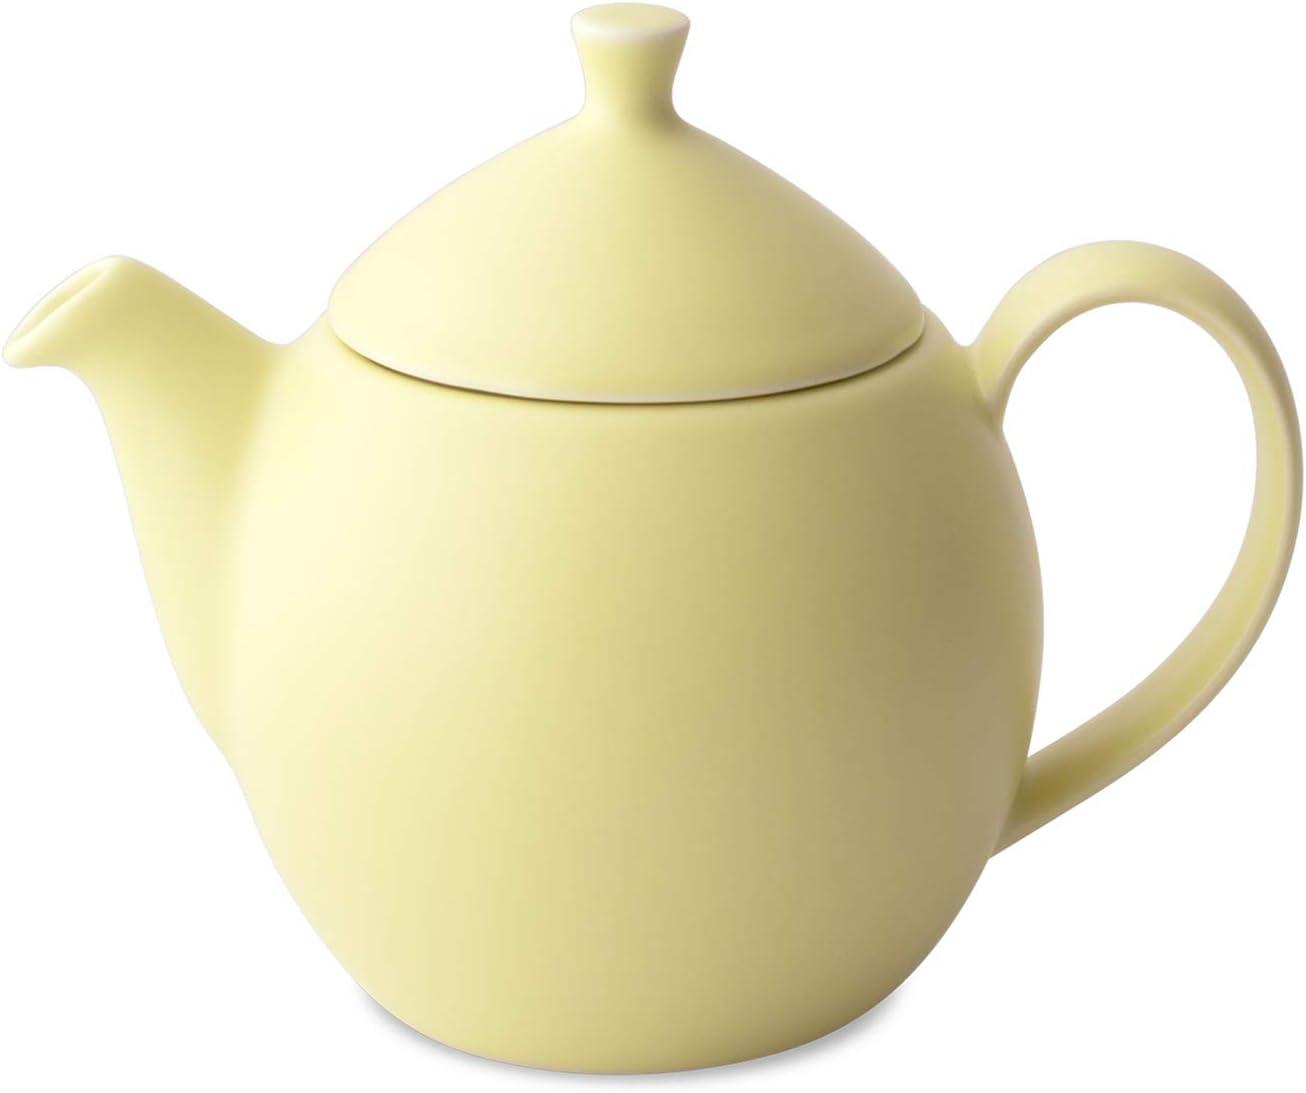 FORLIFE Dew Teapot with Basket Infuser 414ml 14 shipfree Grass oz Lemon Popular